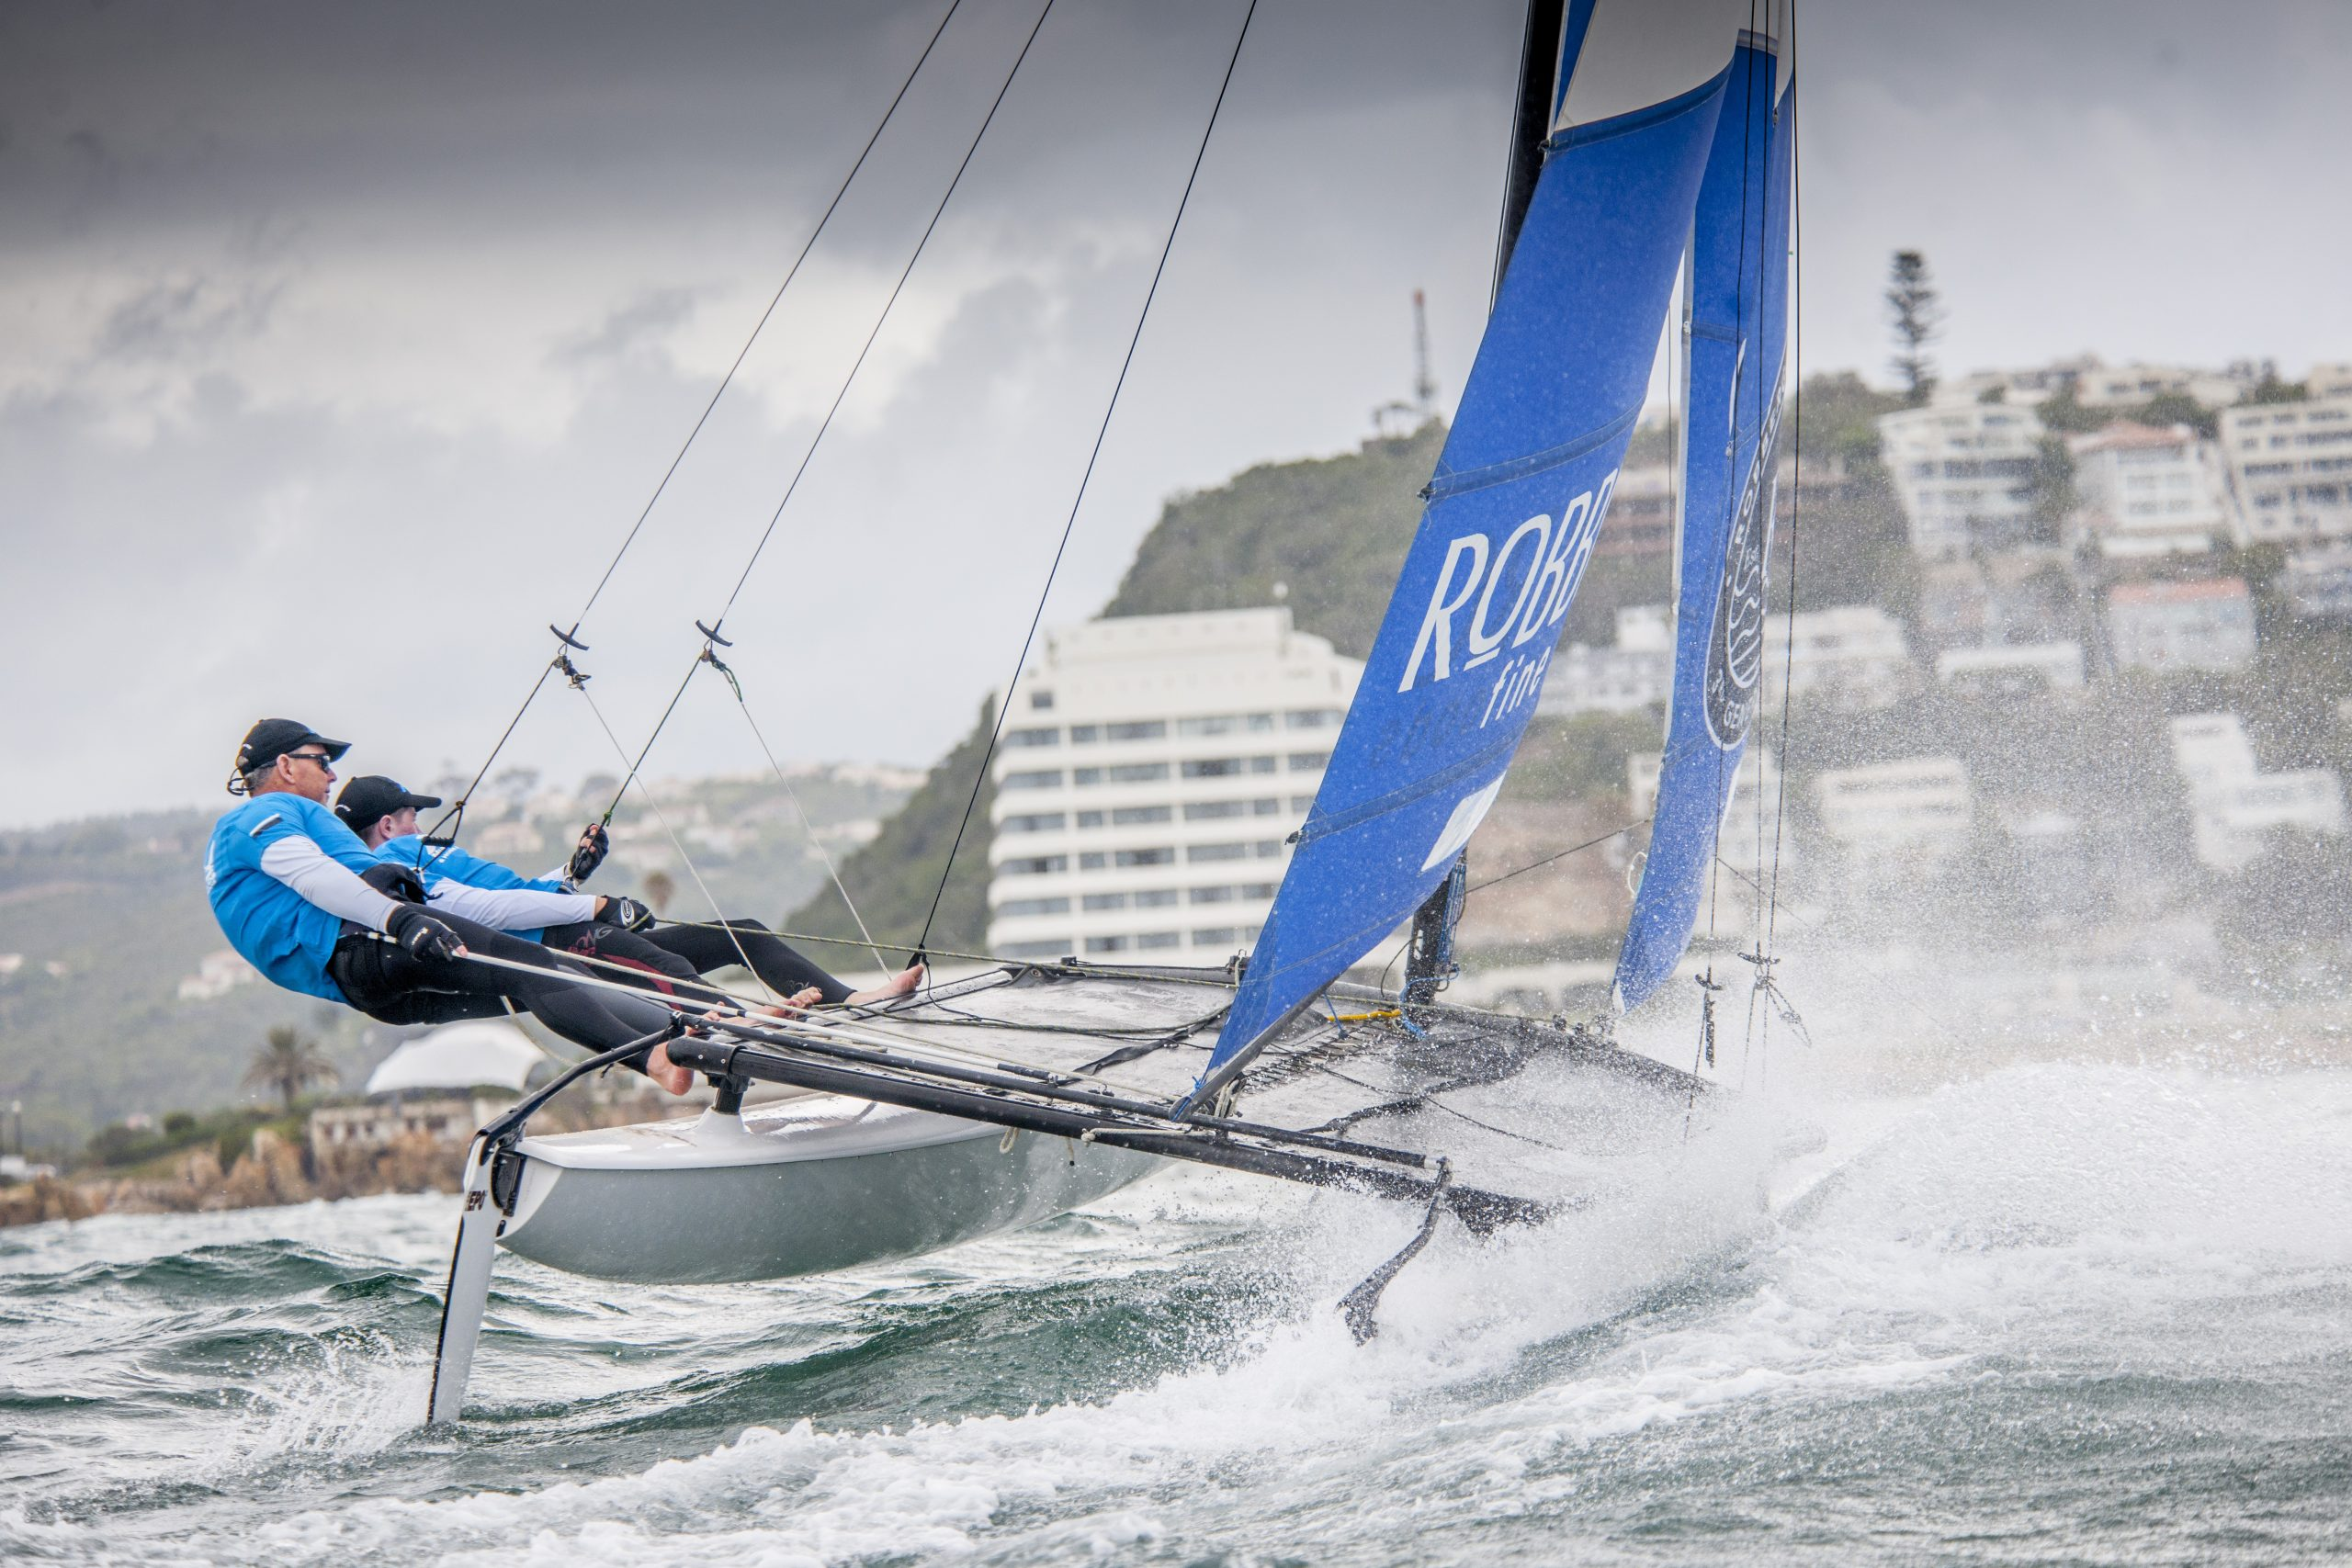 Blaine Dodds sailing in Plett Hobie 16 Nationals Regatta